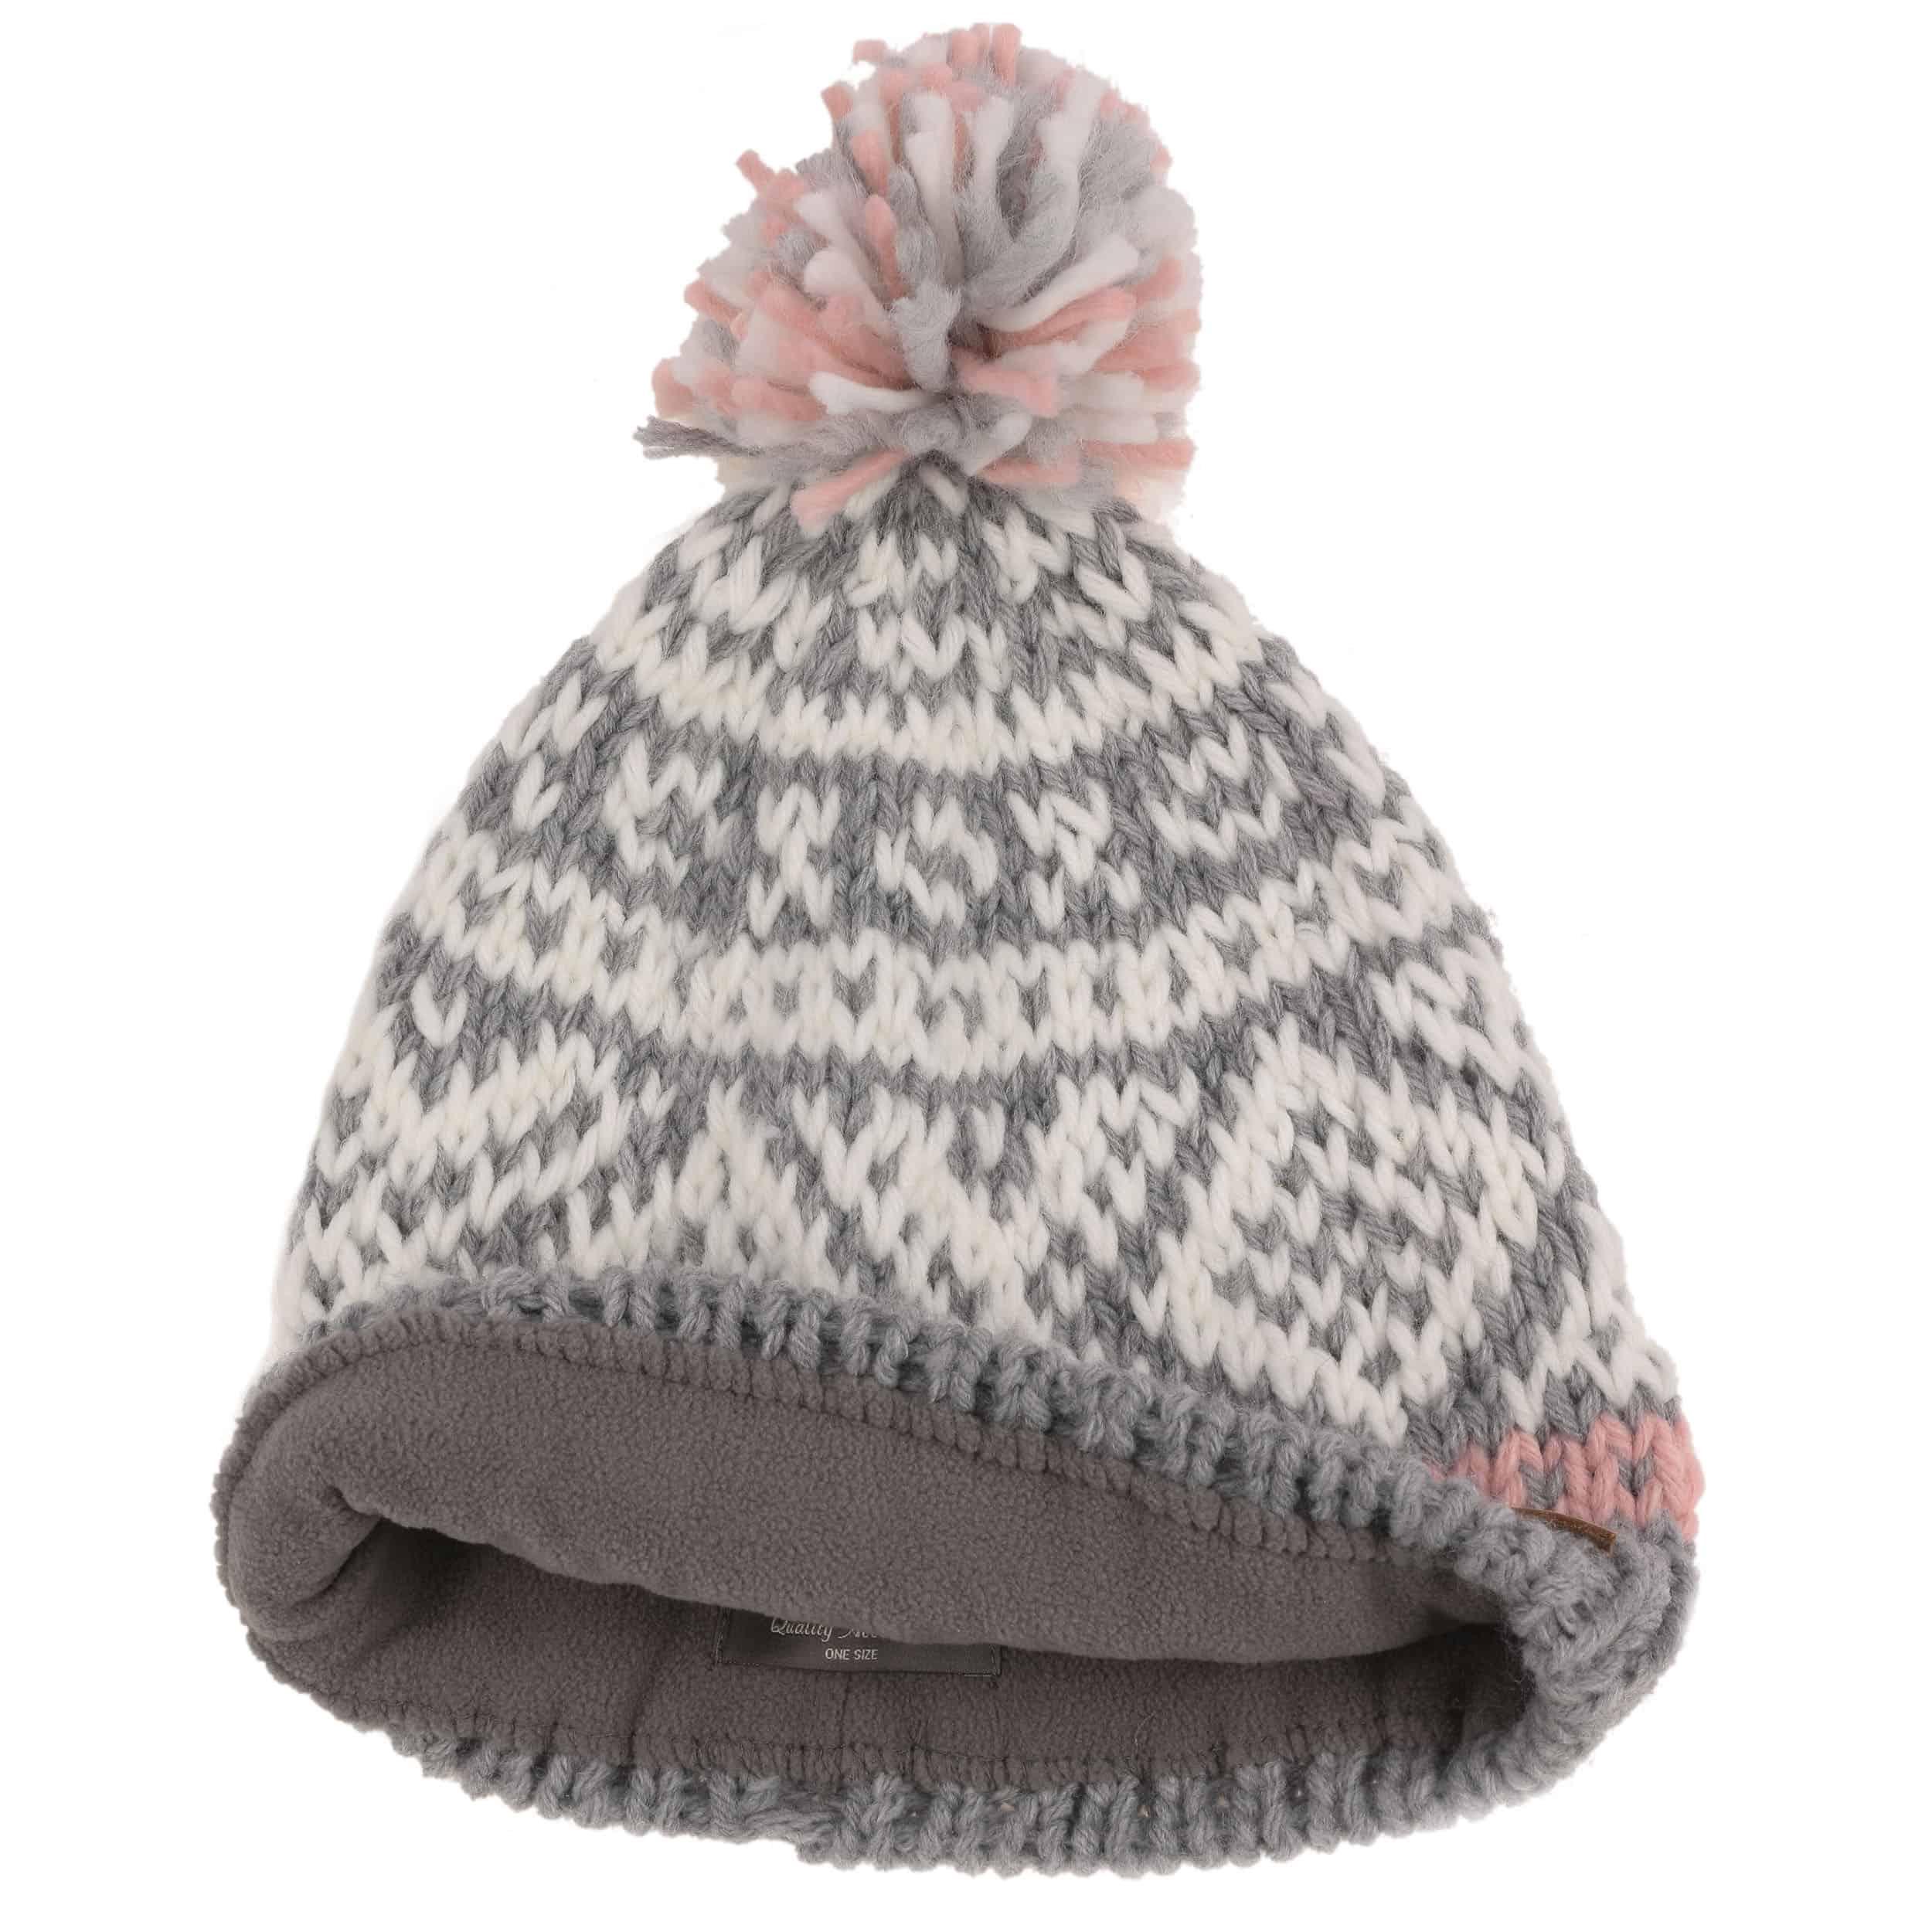 e0142ba4196 ... Log Cabin Pompom Hat by Barts - red 1 ...